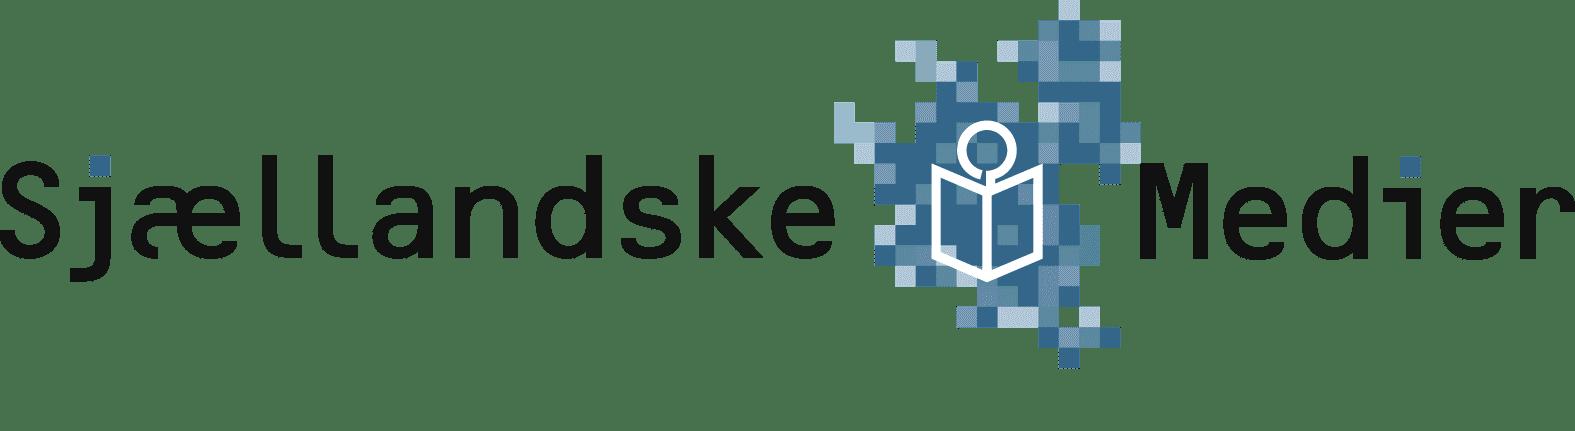 Font, Text, Logo